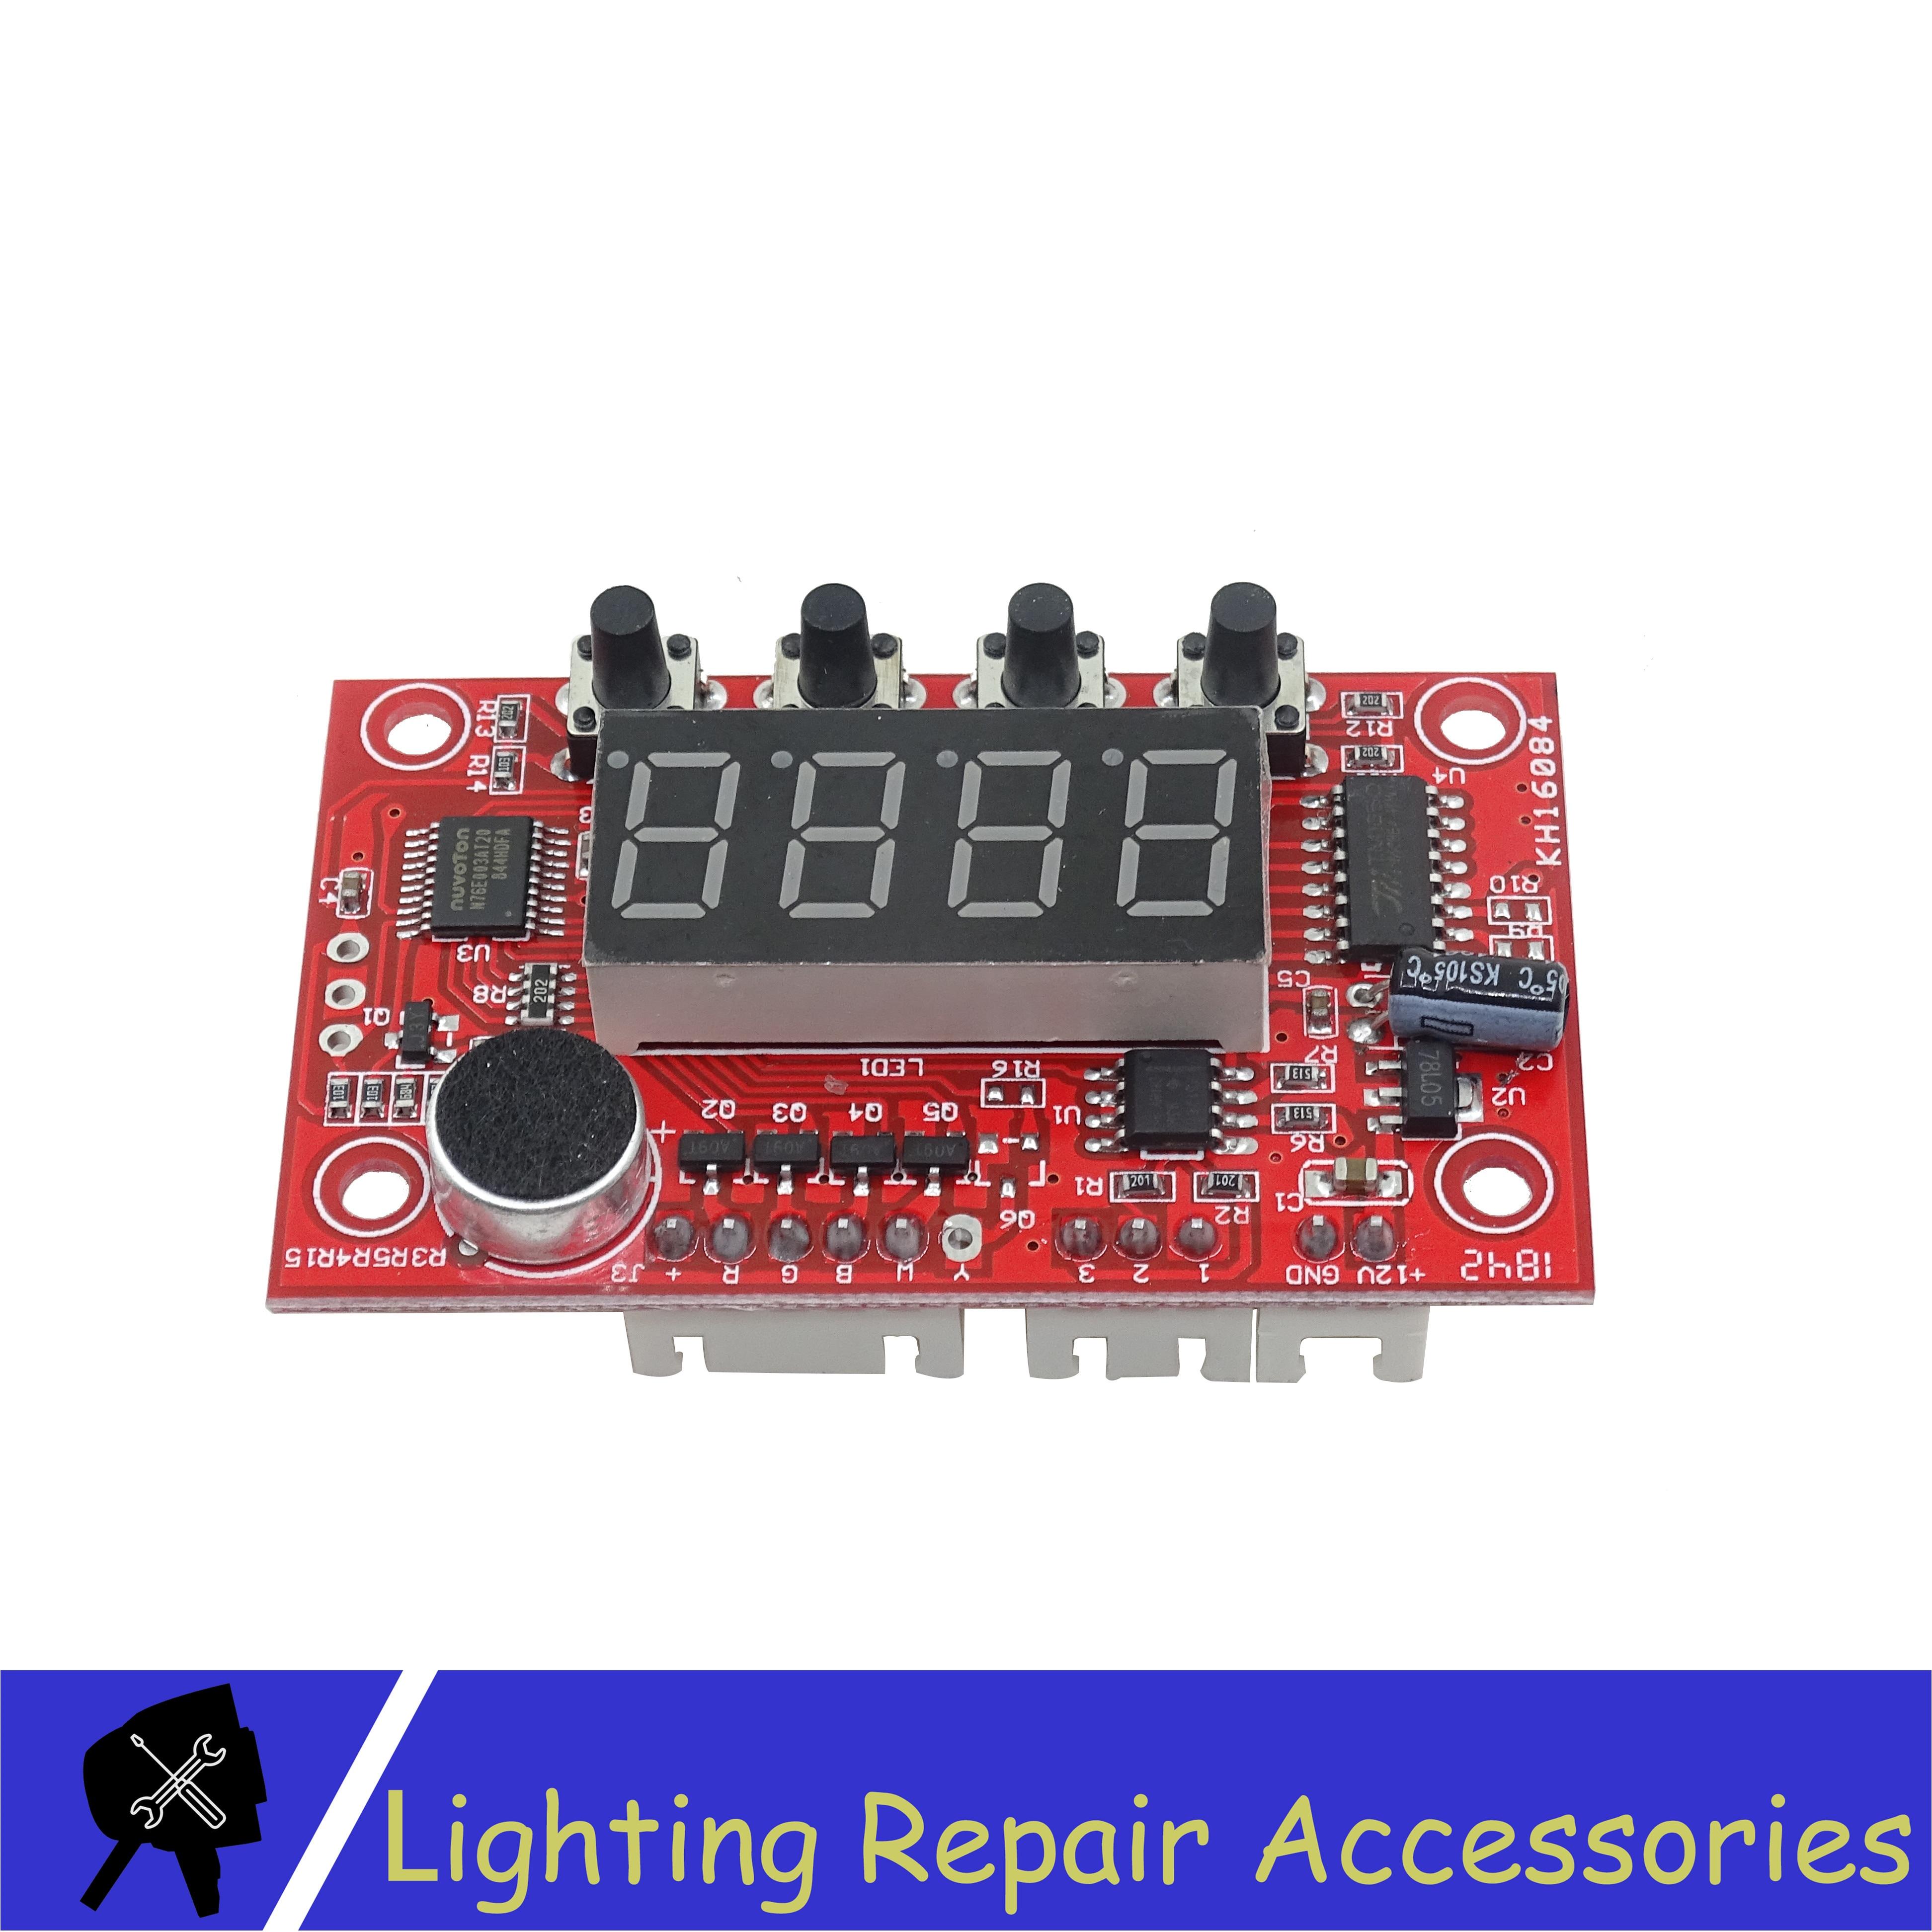 Mini Led Par light mother board use for 12x3w RGBW 12x3w 3in1 RGB 3in1 Mini Cob 3x10w 5x10w Repair spare parts